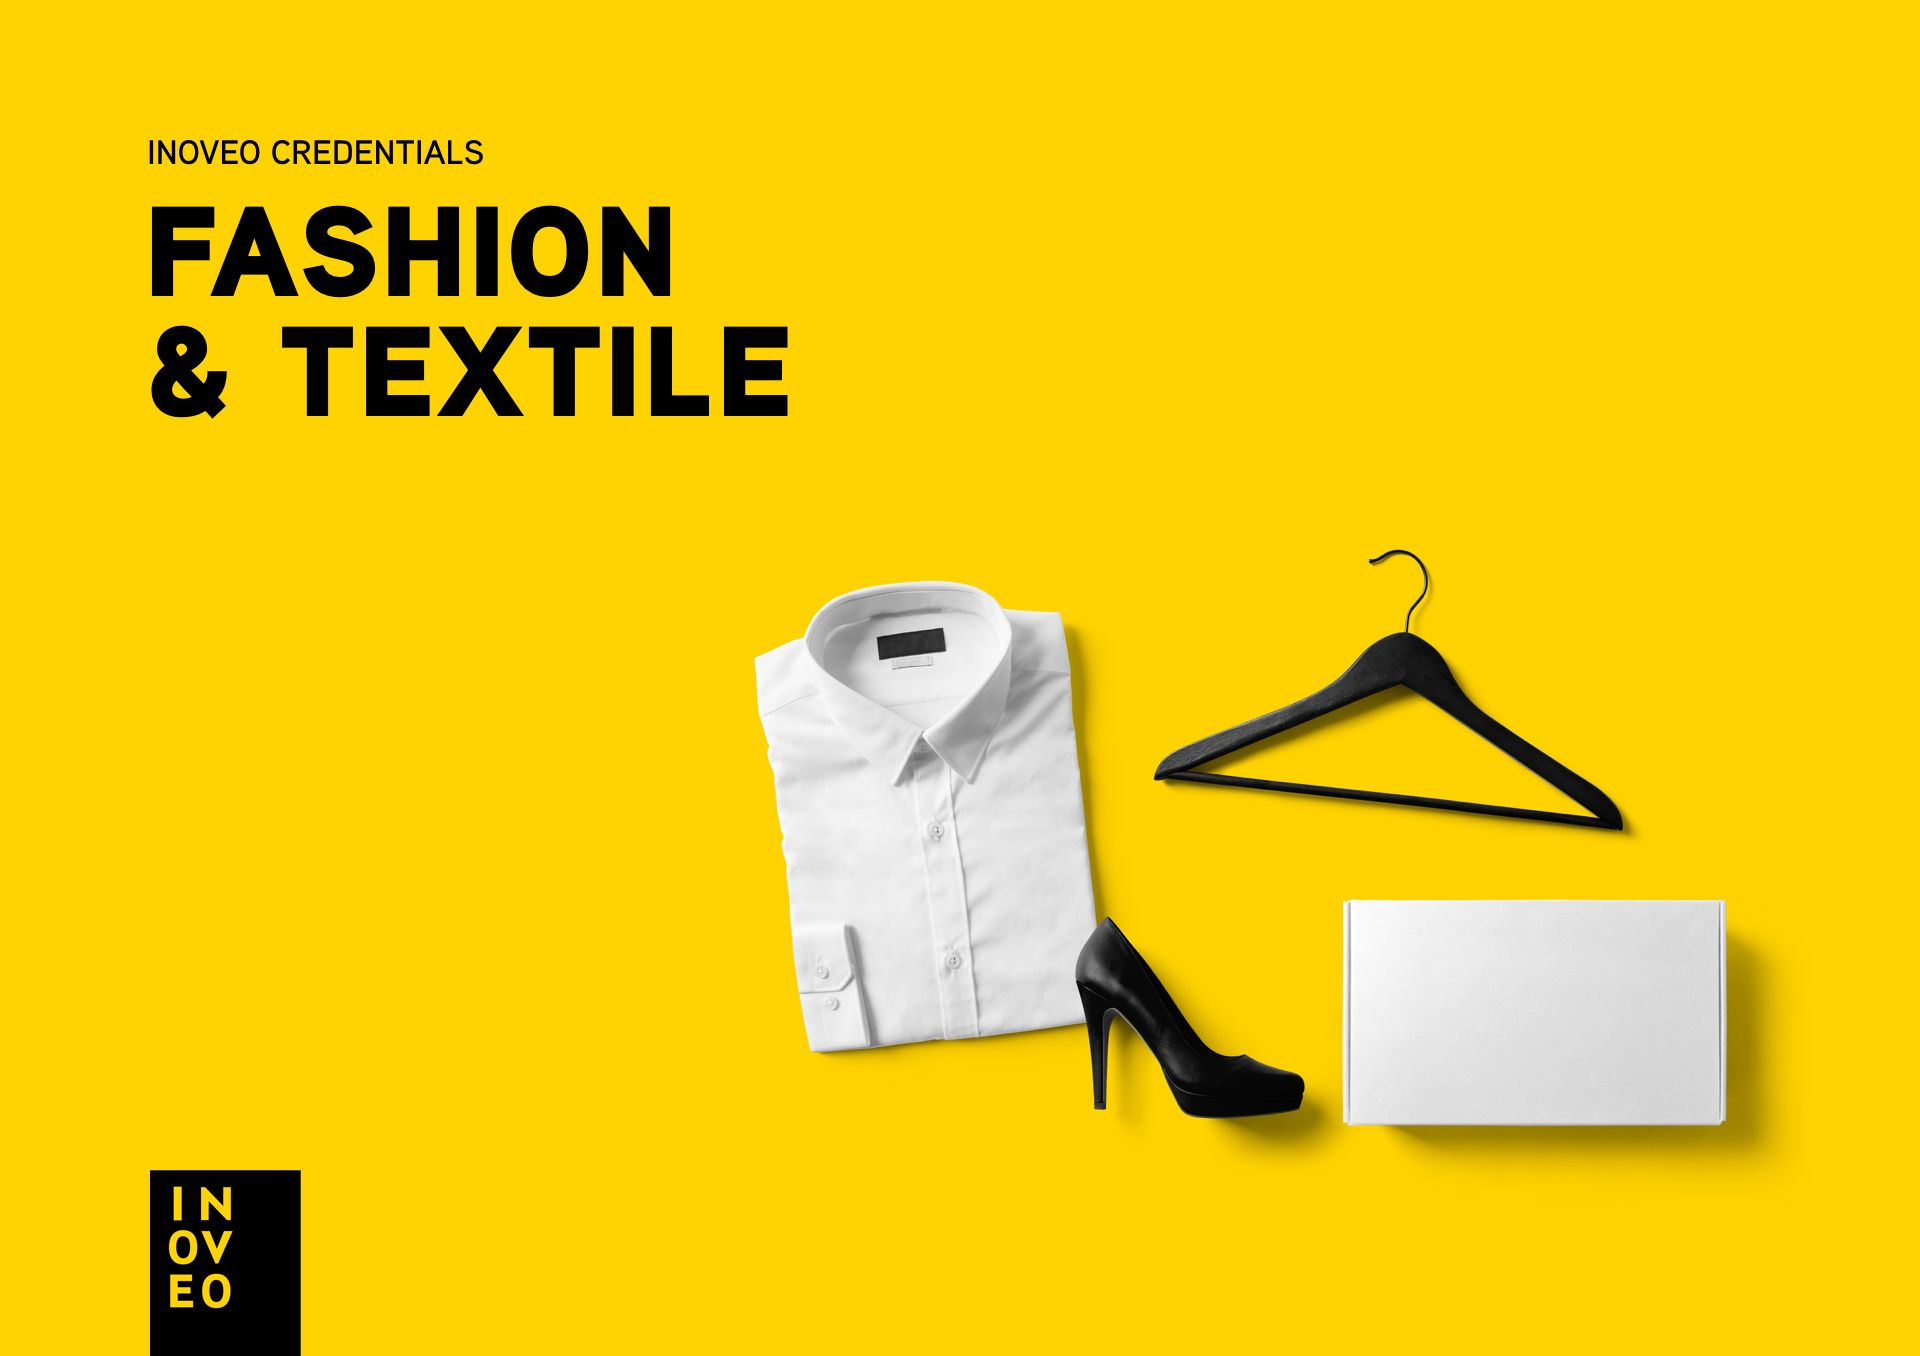 Fashion & Textile credentials INOVEO branding